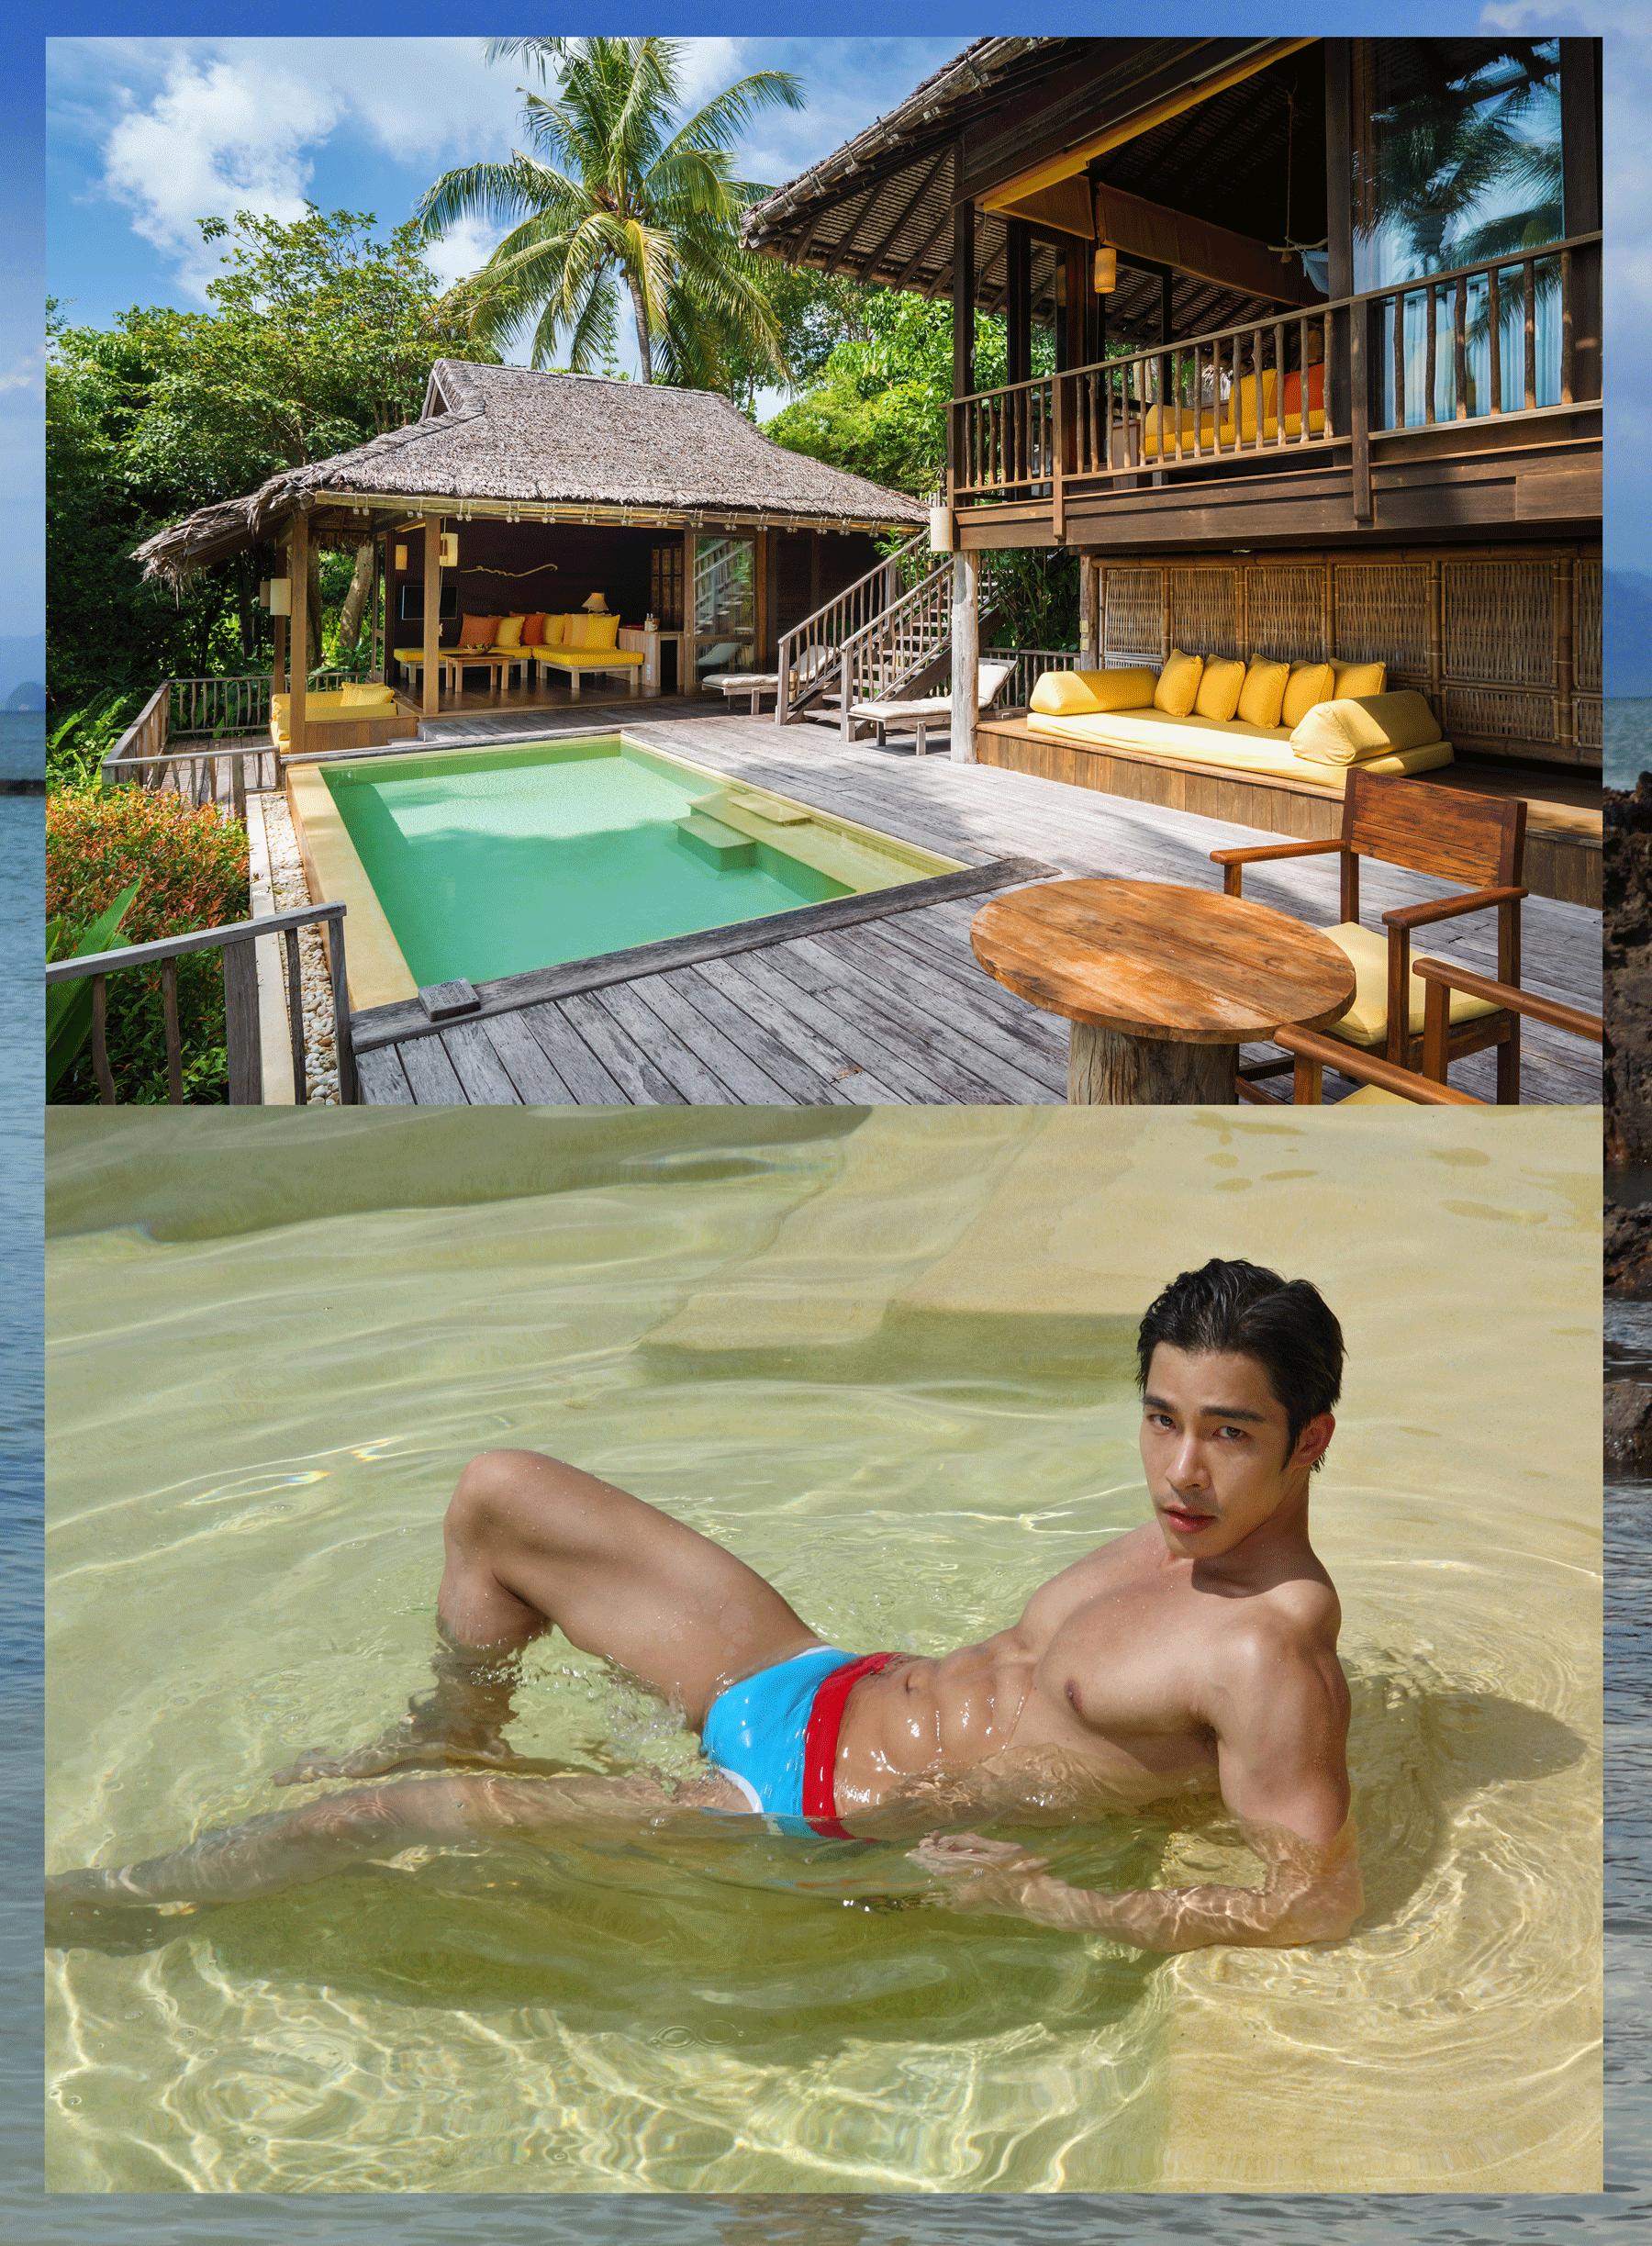 Six Senses Yao Noi Resort  Photo : Virapoj Tu Asavajarn  Model : Nat Sakdatorn @natsakdatorn  Swimwear : NOXX wear @noxxwear  Location : Six Senses Yao Noi Resort  56 Moo 5 Tambol Koh Yao Noi Amphur Koh Yao Phang Nga 82160 Thailand T +66 7641 8500 http://www.sixsenses.com  Special Thanks : Bangkok Airways